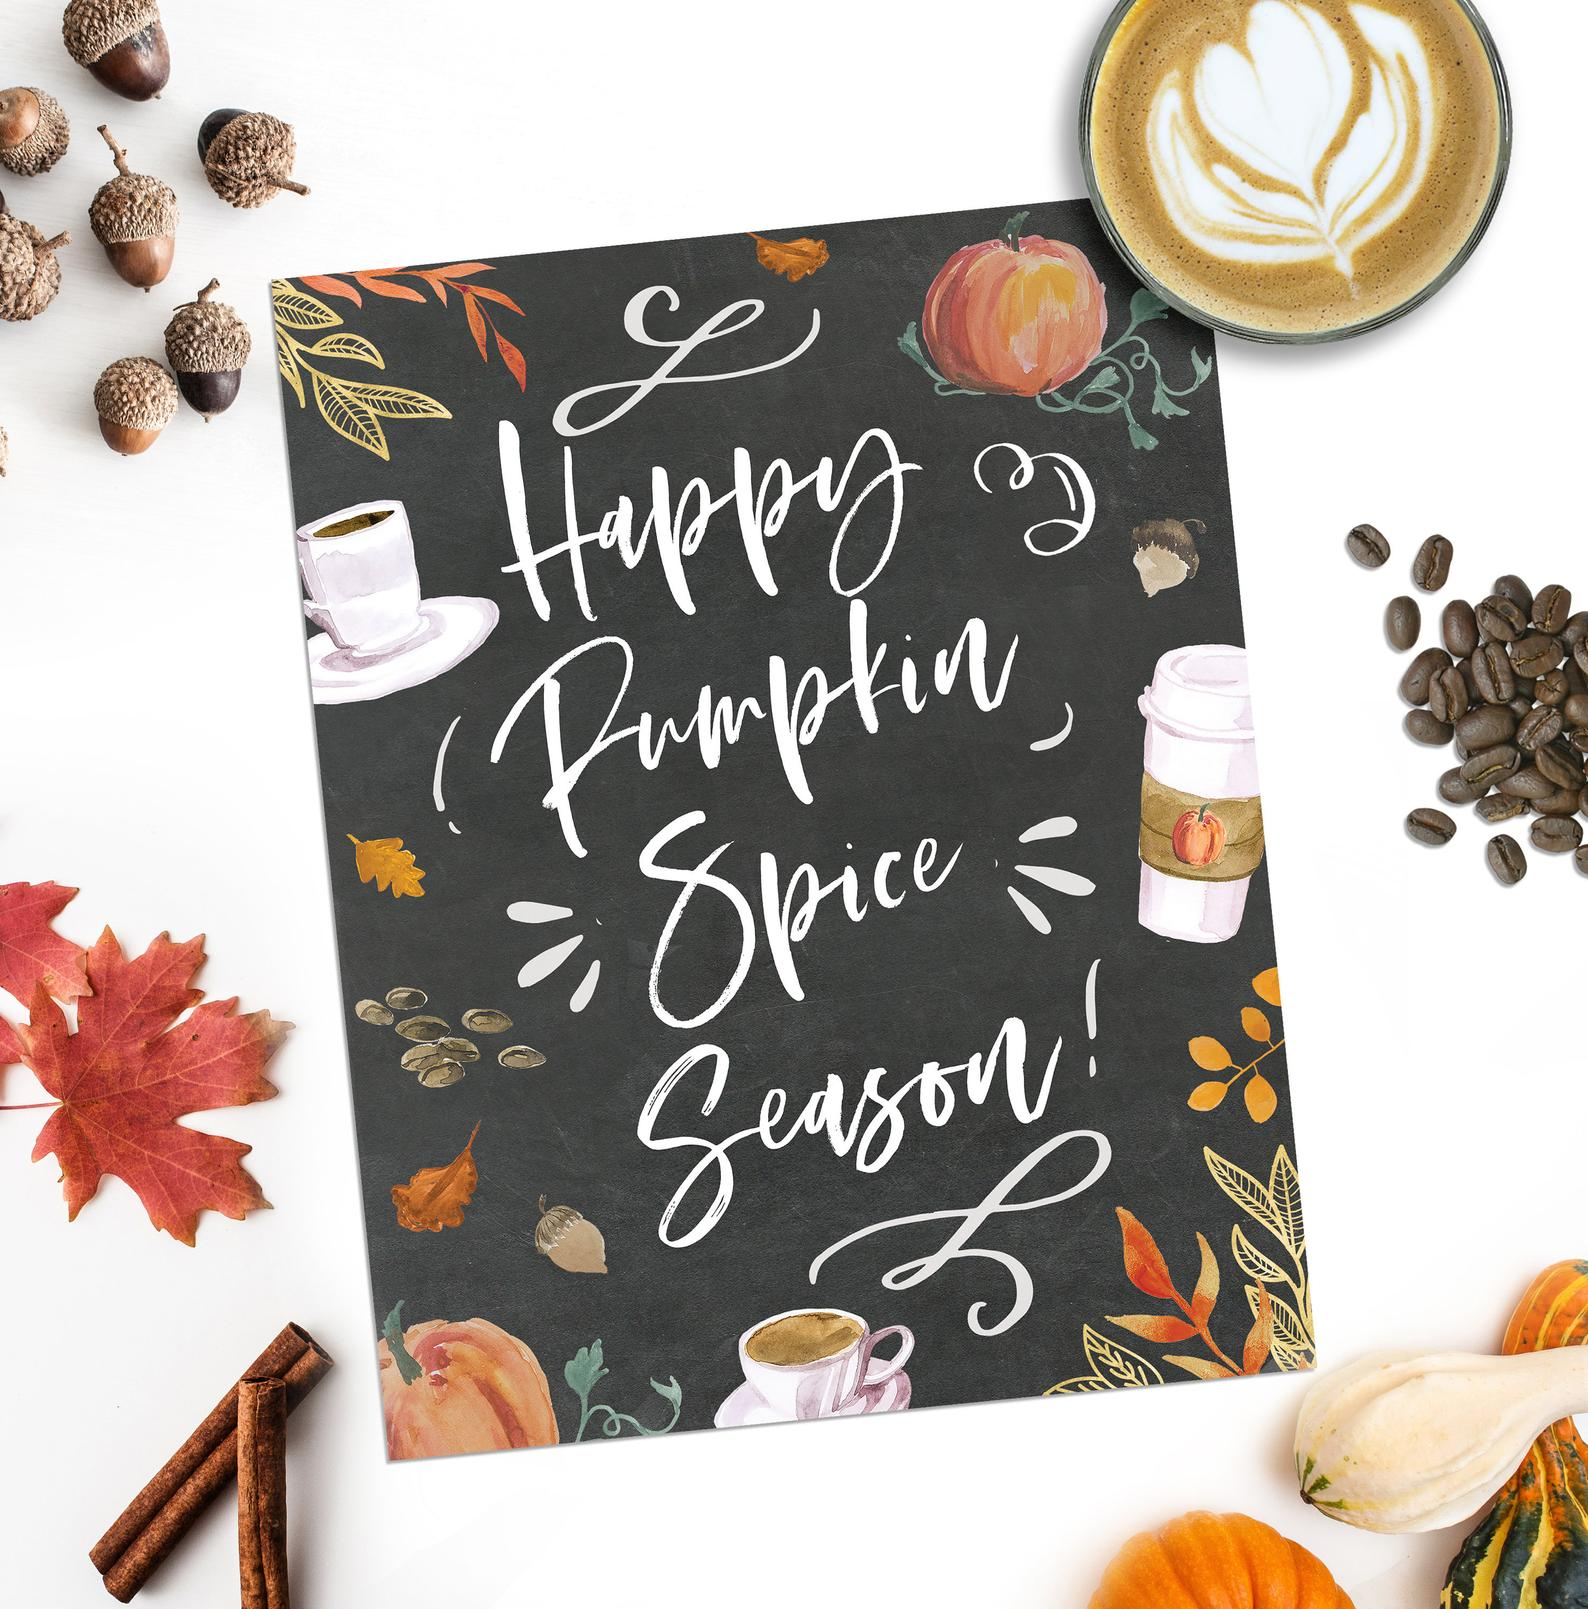 Happy Pumpkin Spice Season Printable Fall Home Decor By Adoren Studio